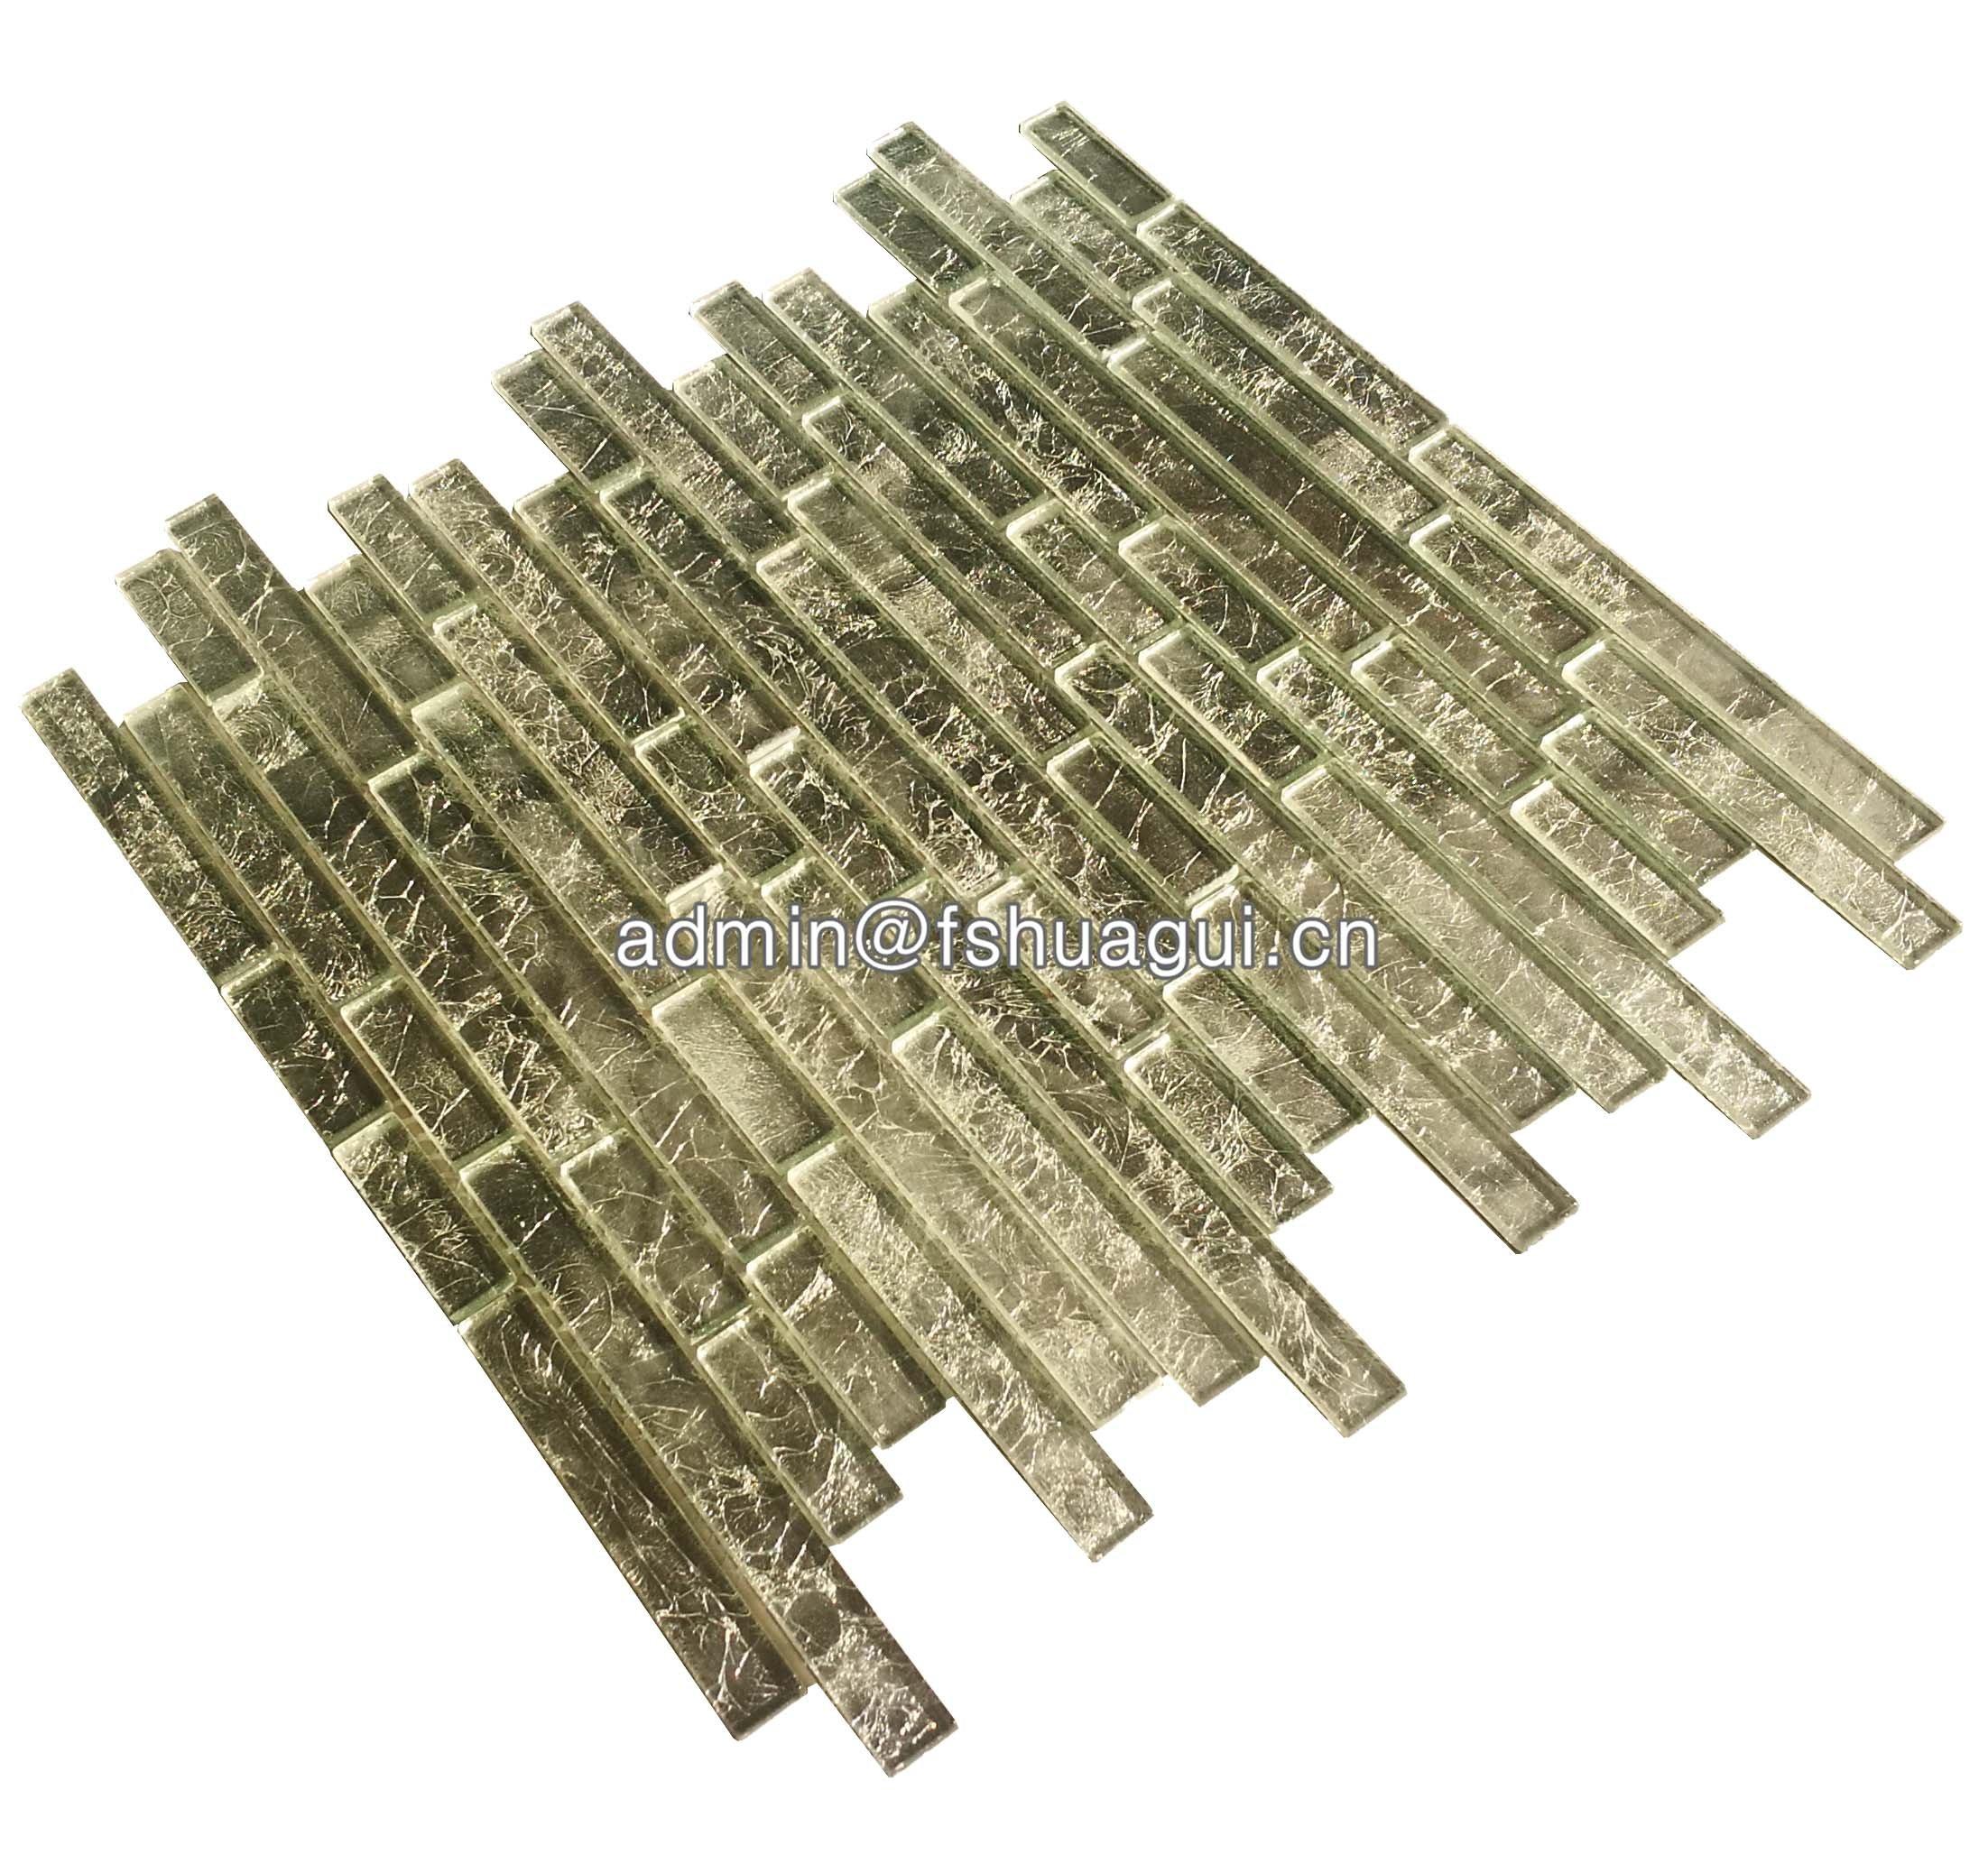 Huagui Glass Mosaic Tile HG-CDF009 GLASS MOSAIC TILE image30